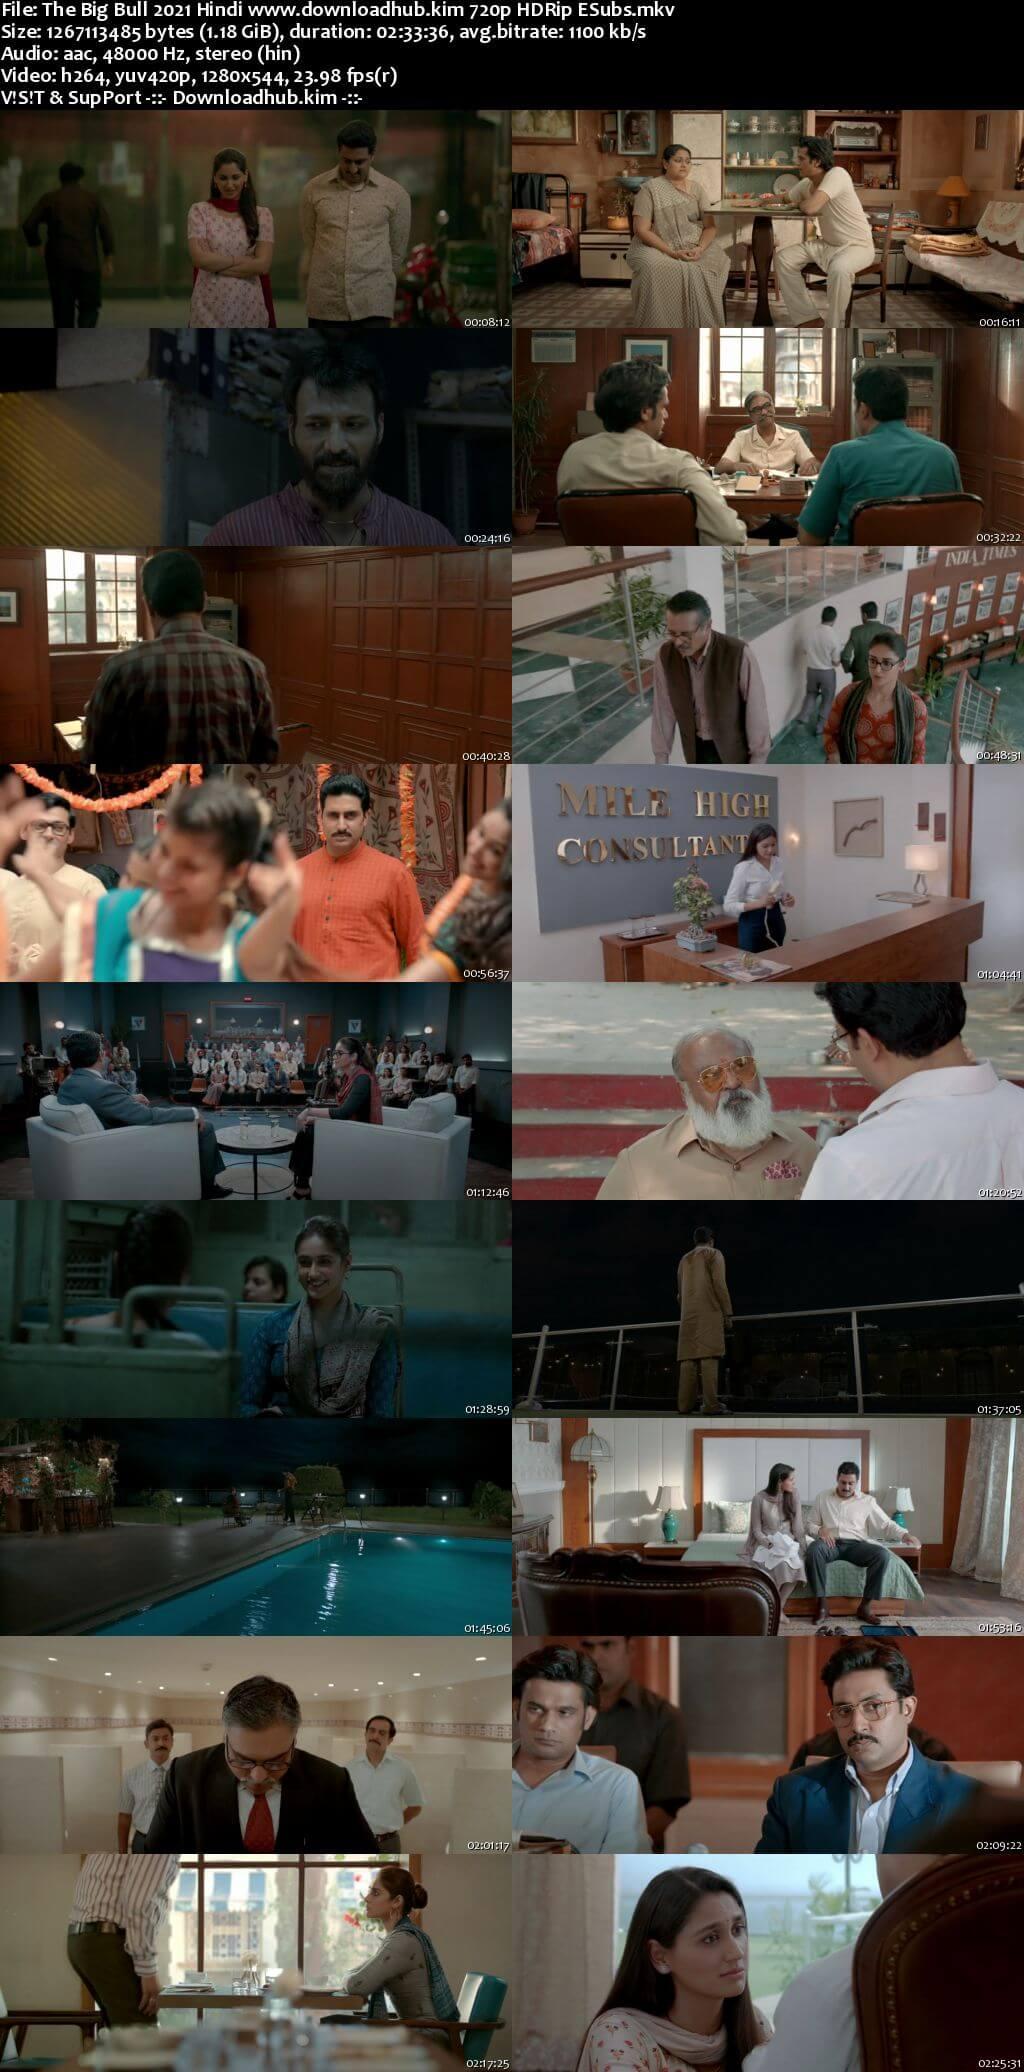 The Big Bull 2021 Hindi 720p HDRip ESubs